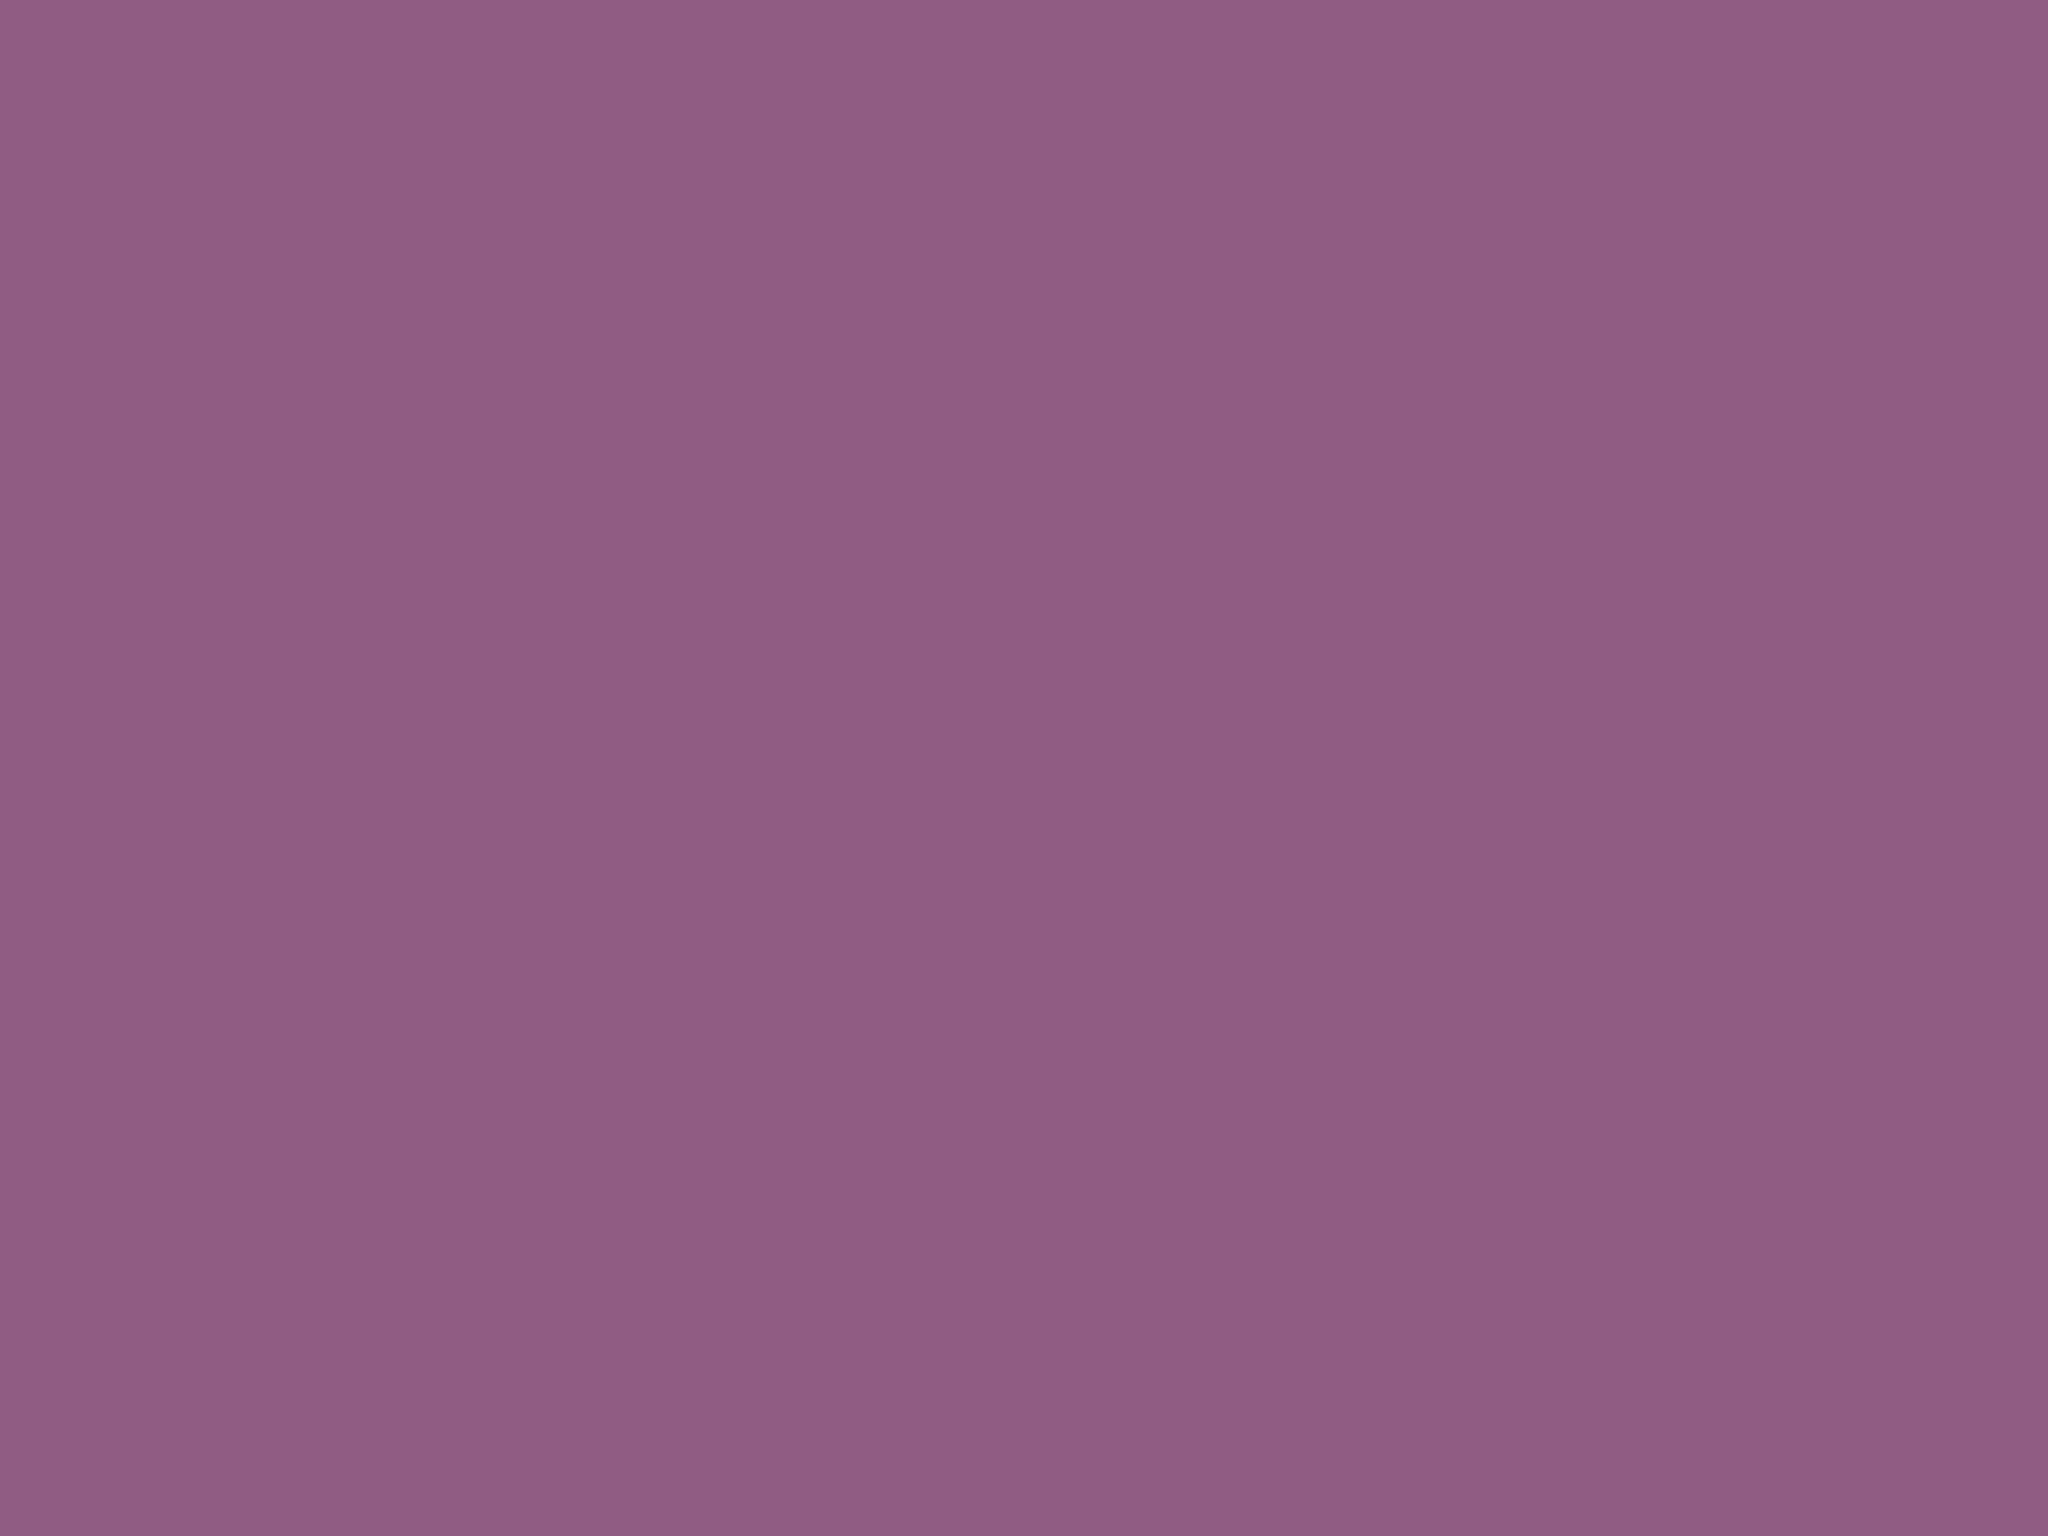 2048x1536 Antique Fuchsia Solid Color Background